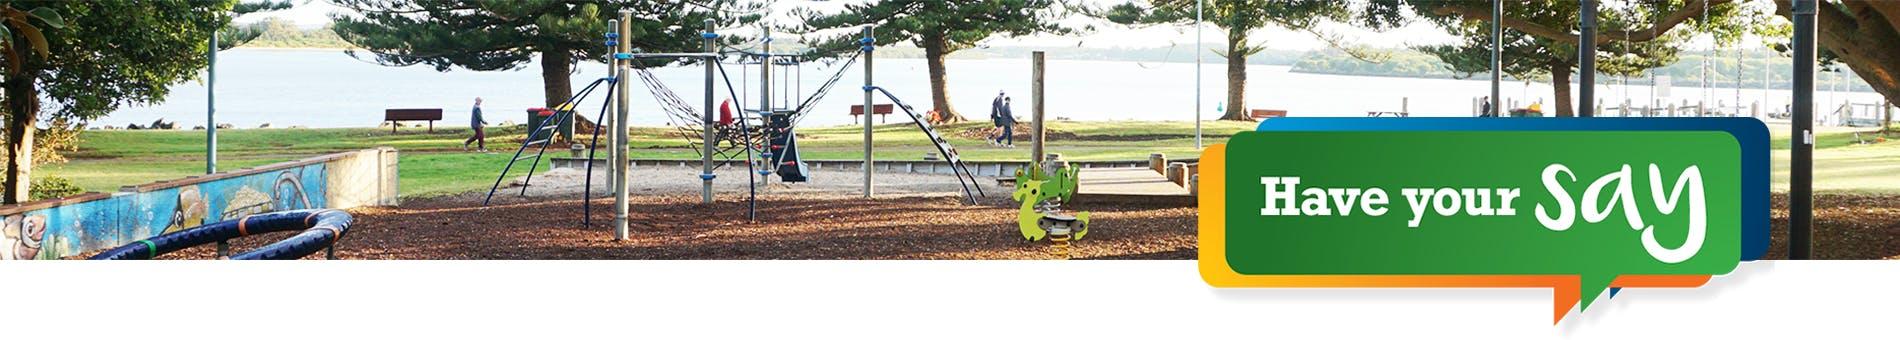 Town Green Playground